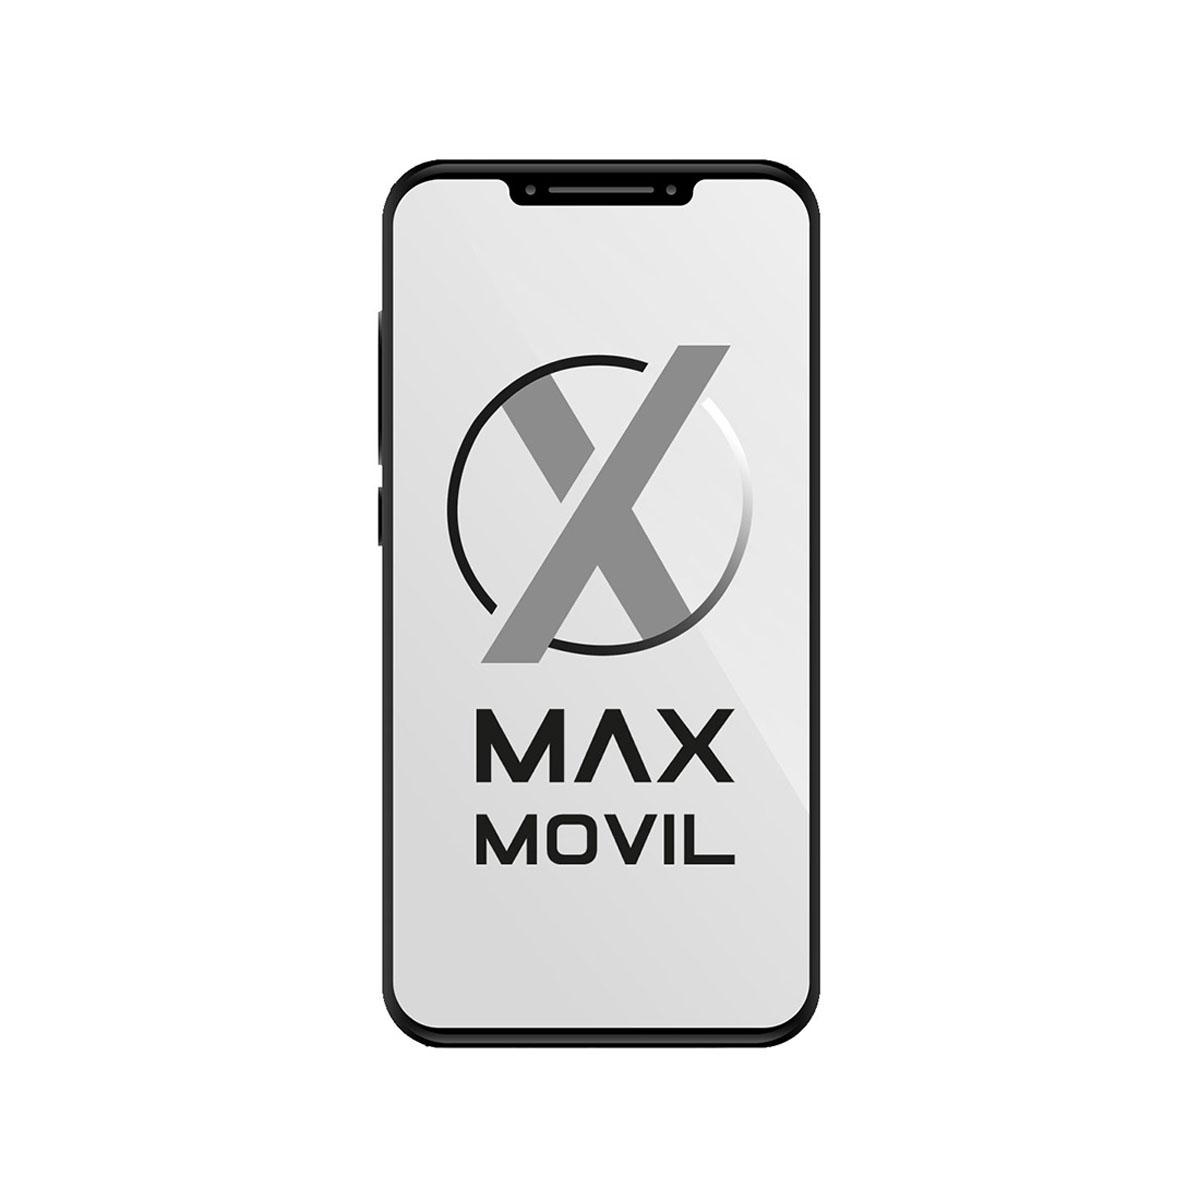 https://i1.wp.com/www.maxmovil.com/media/catalog/product/cache/1/image/265x265/9df78eab33525d08d6e5fb8d27136e95/c/o/cogito_productindex_20150617_12__65165.1434682049.500.500.jpg